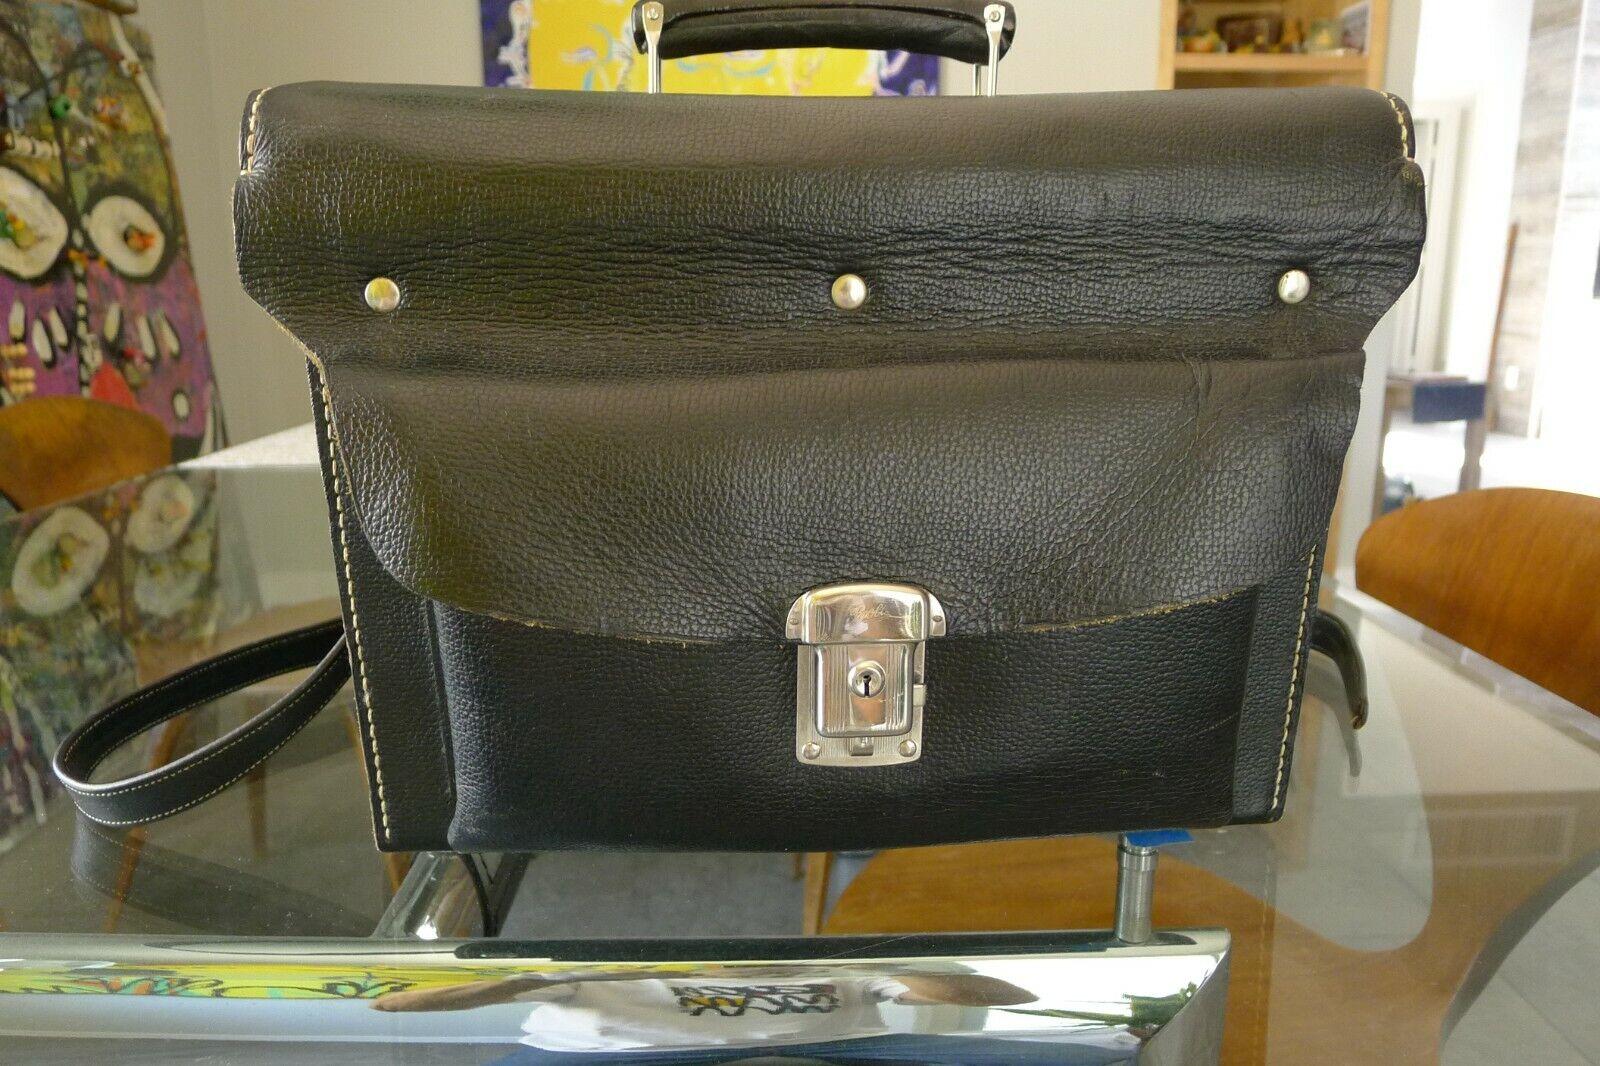 Hasselblad Black Leather Case 518 Press/Reporter Holds Cameras Lenses Backs